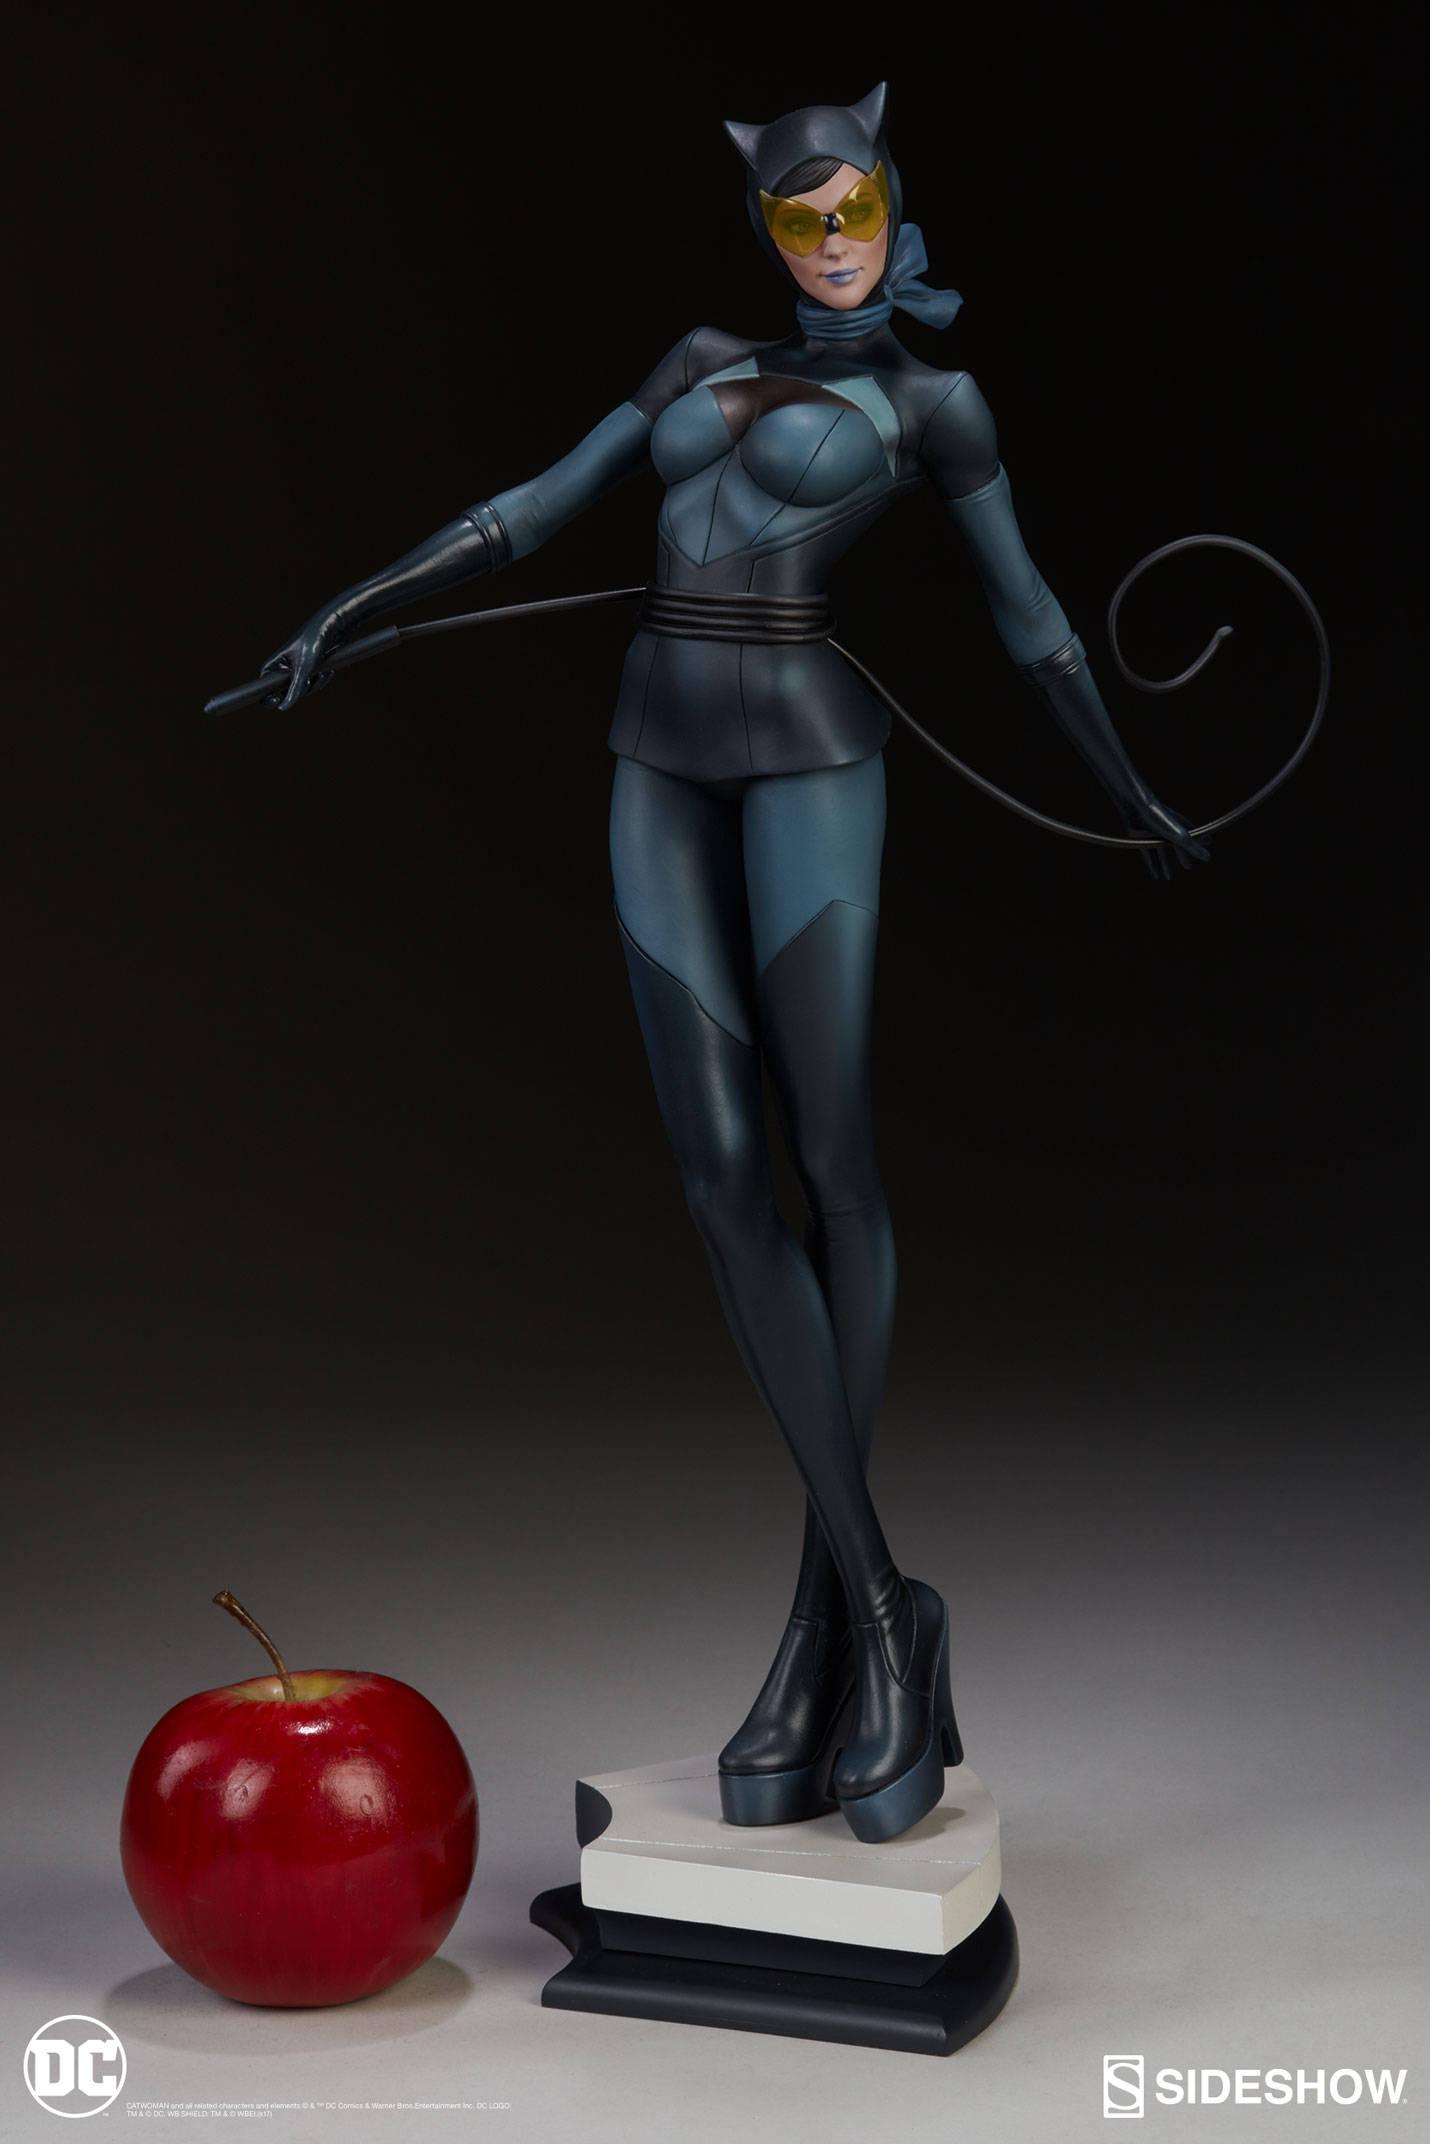 Catwoman-Sideshow-Artgerm-Statue08